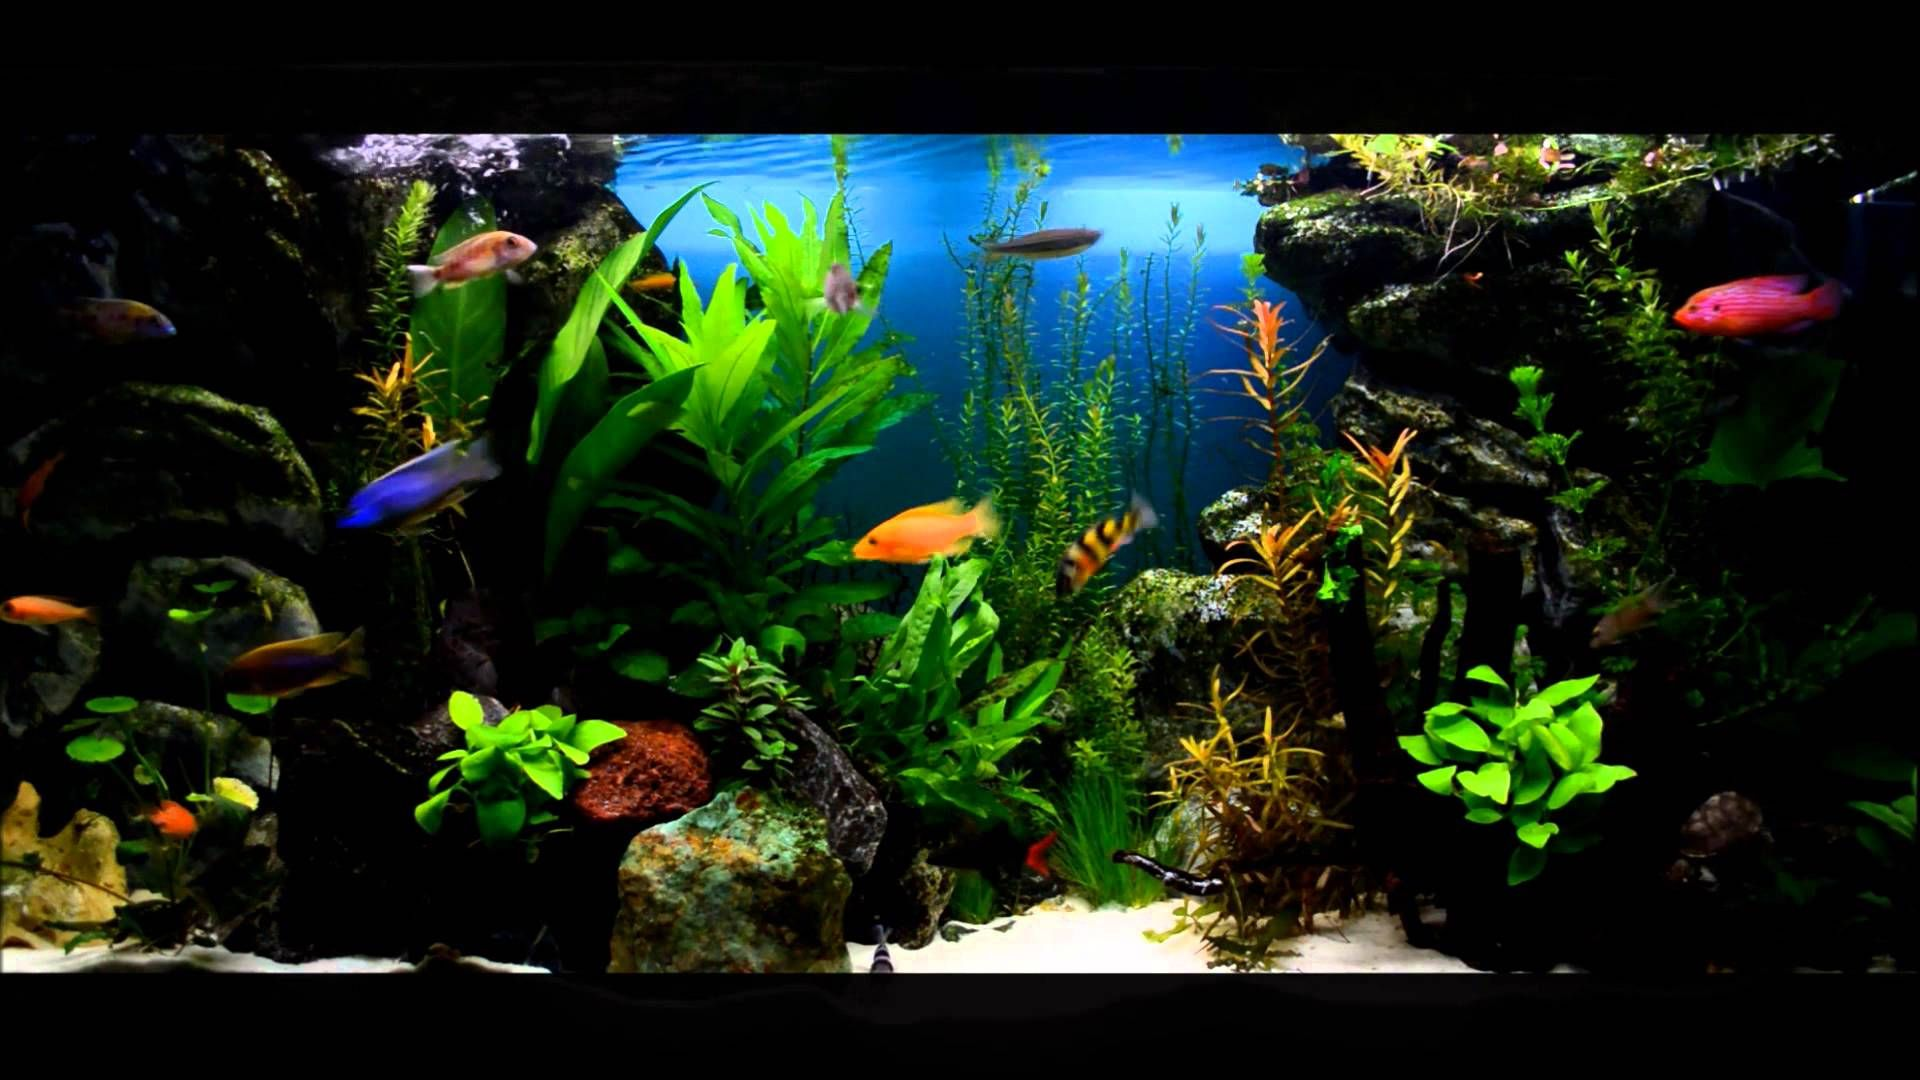 4c10b1525f703296f12f3e1e37959c51 Luxe De Crevette Aquarium Des Idées